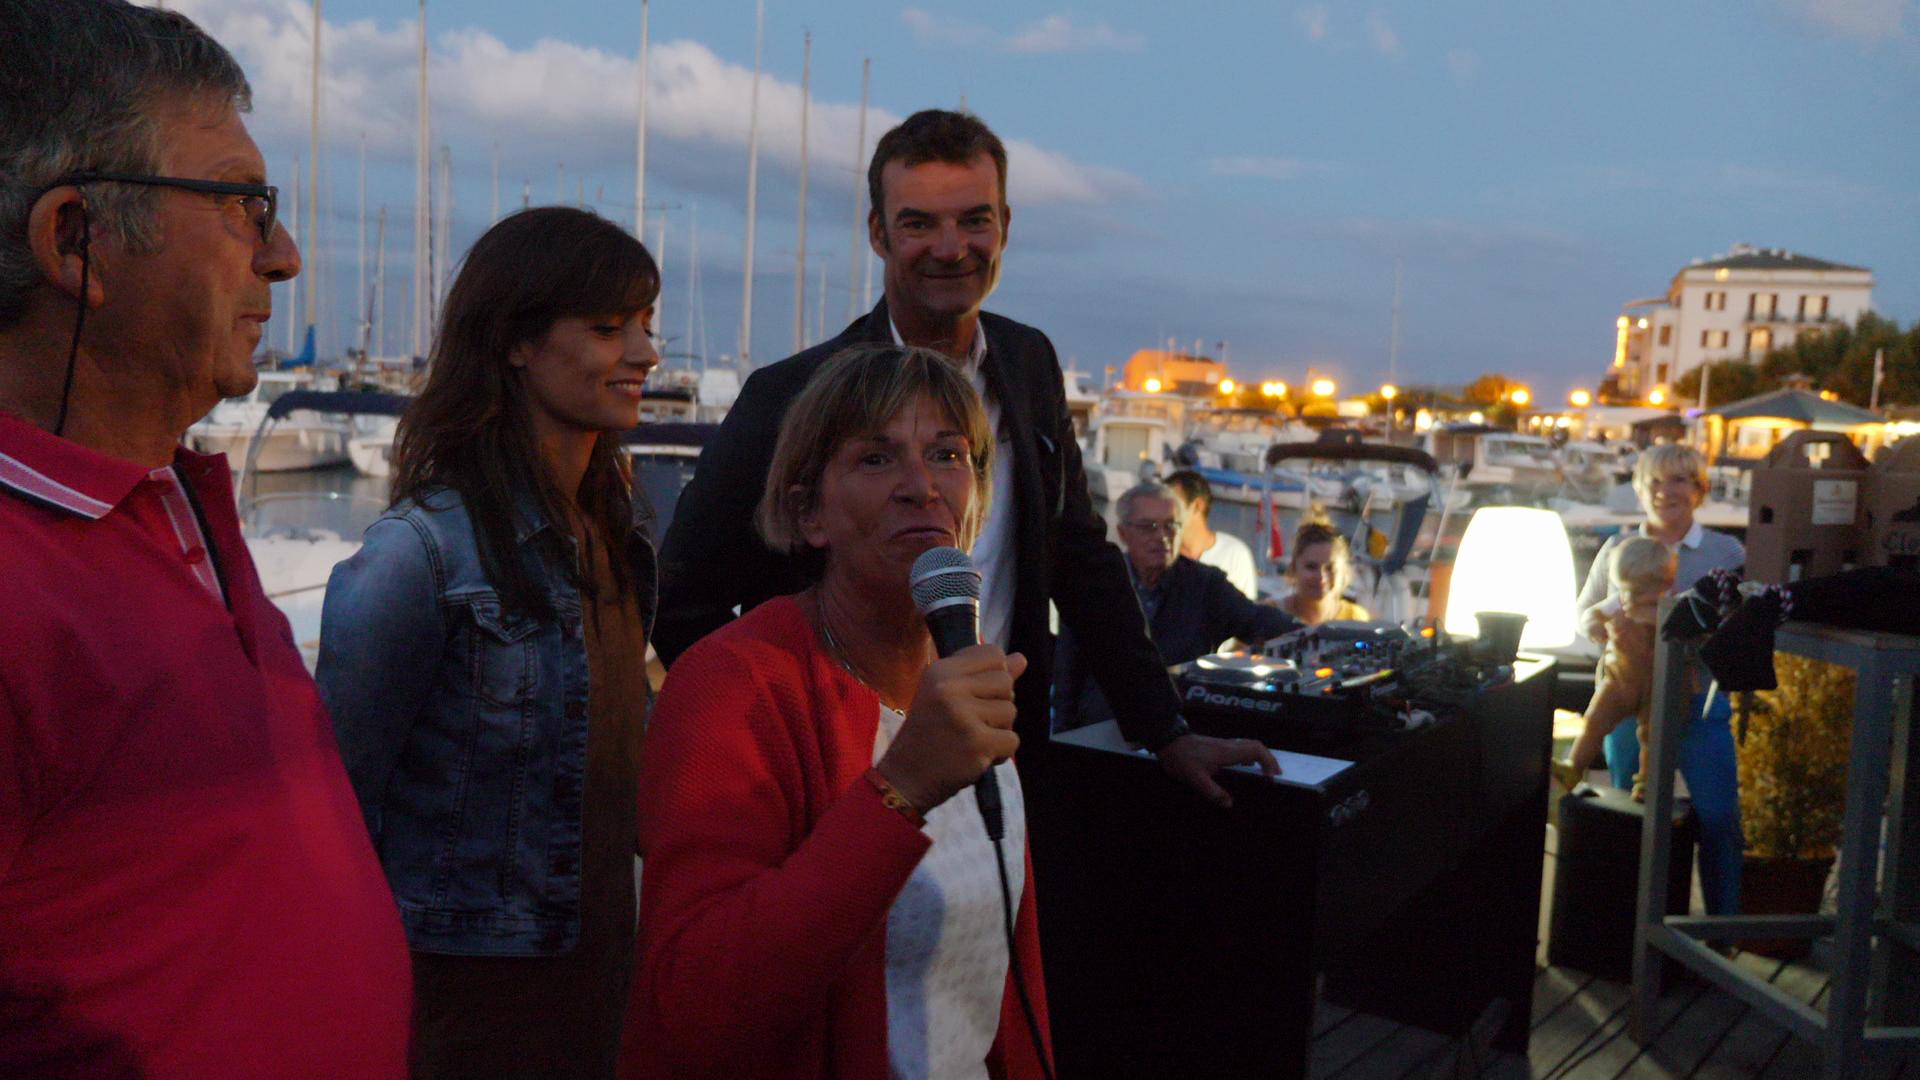 CC 2018 Remise des prix Bastia - Macinaggio Mr le Maire Patrice Quilici, Zaza Murzilli, Tania Young Marraine de la Corsica Classic, Thibaud Assante photo JP Pyrée DR